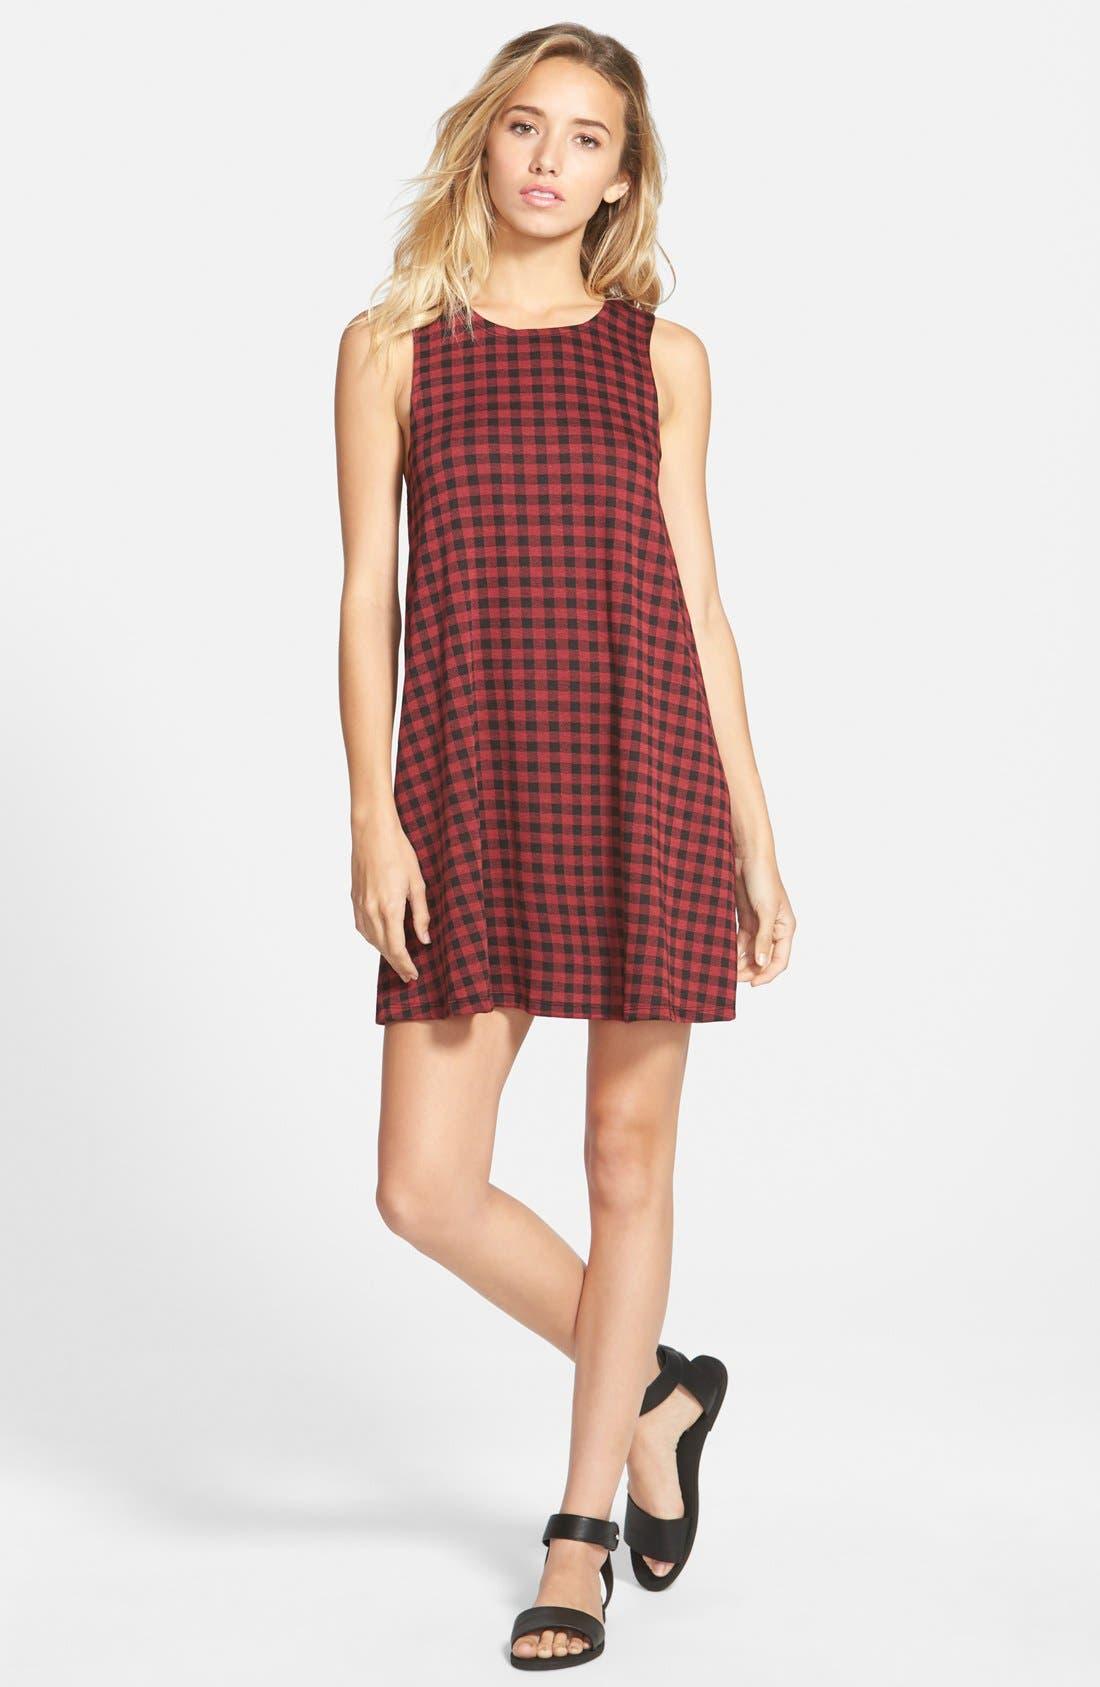 Alternate Image 1 Selected - Socialite Plaid Sleeveless Shift Dress